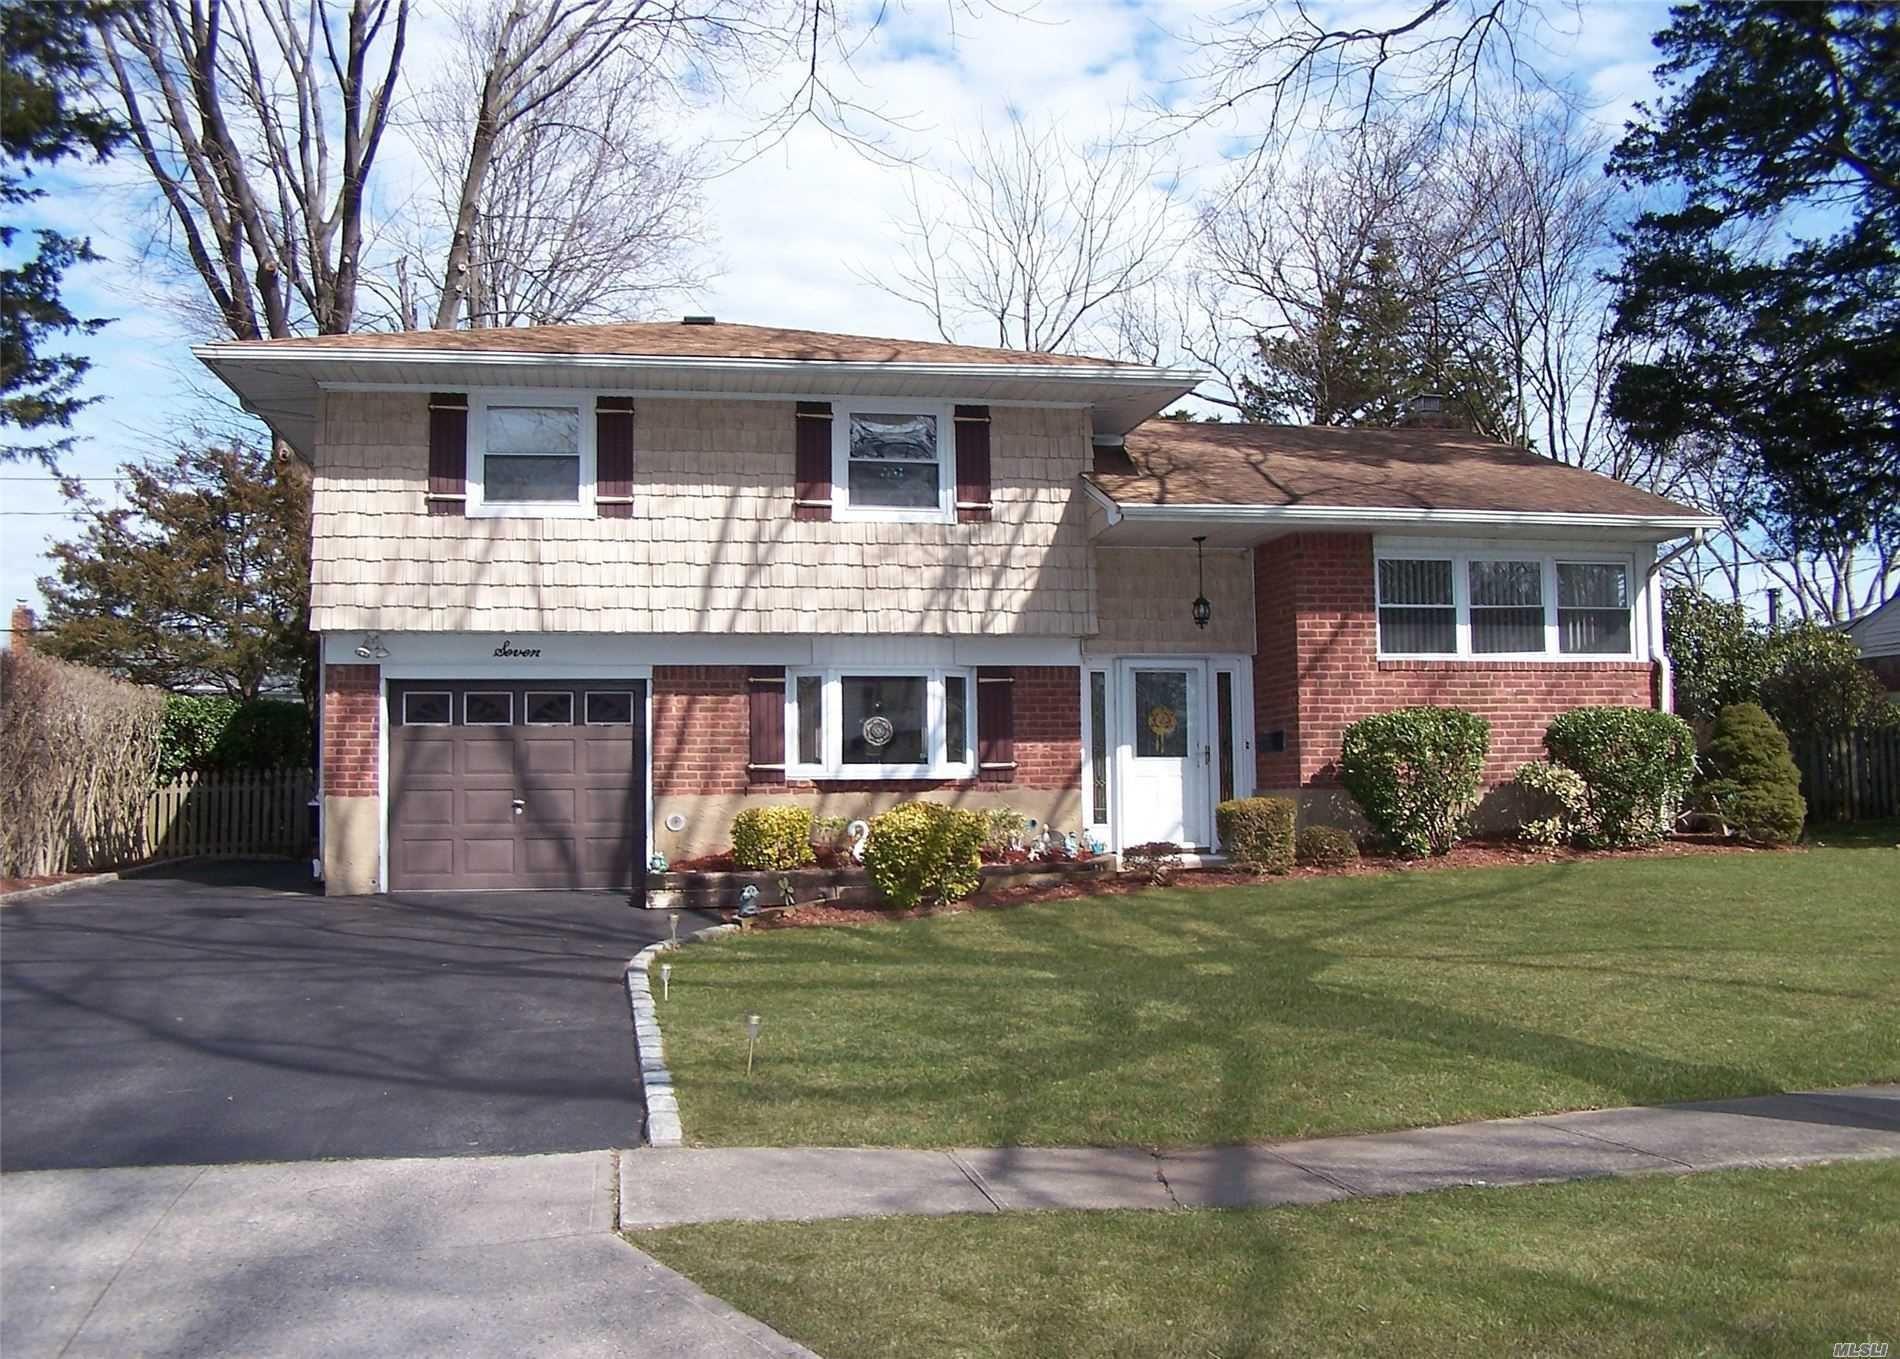 7 Rensselaer Drive, Commack, NY 11725 - MLS#: 3207400